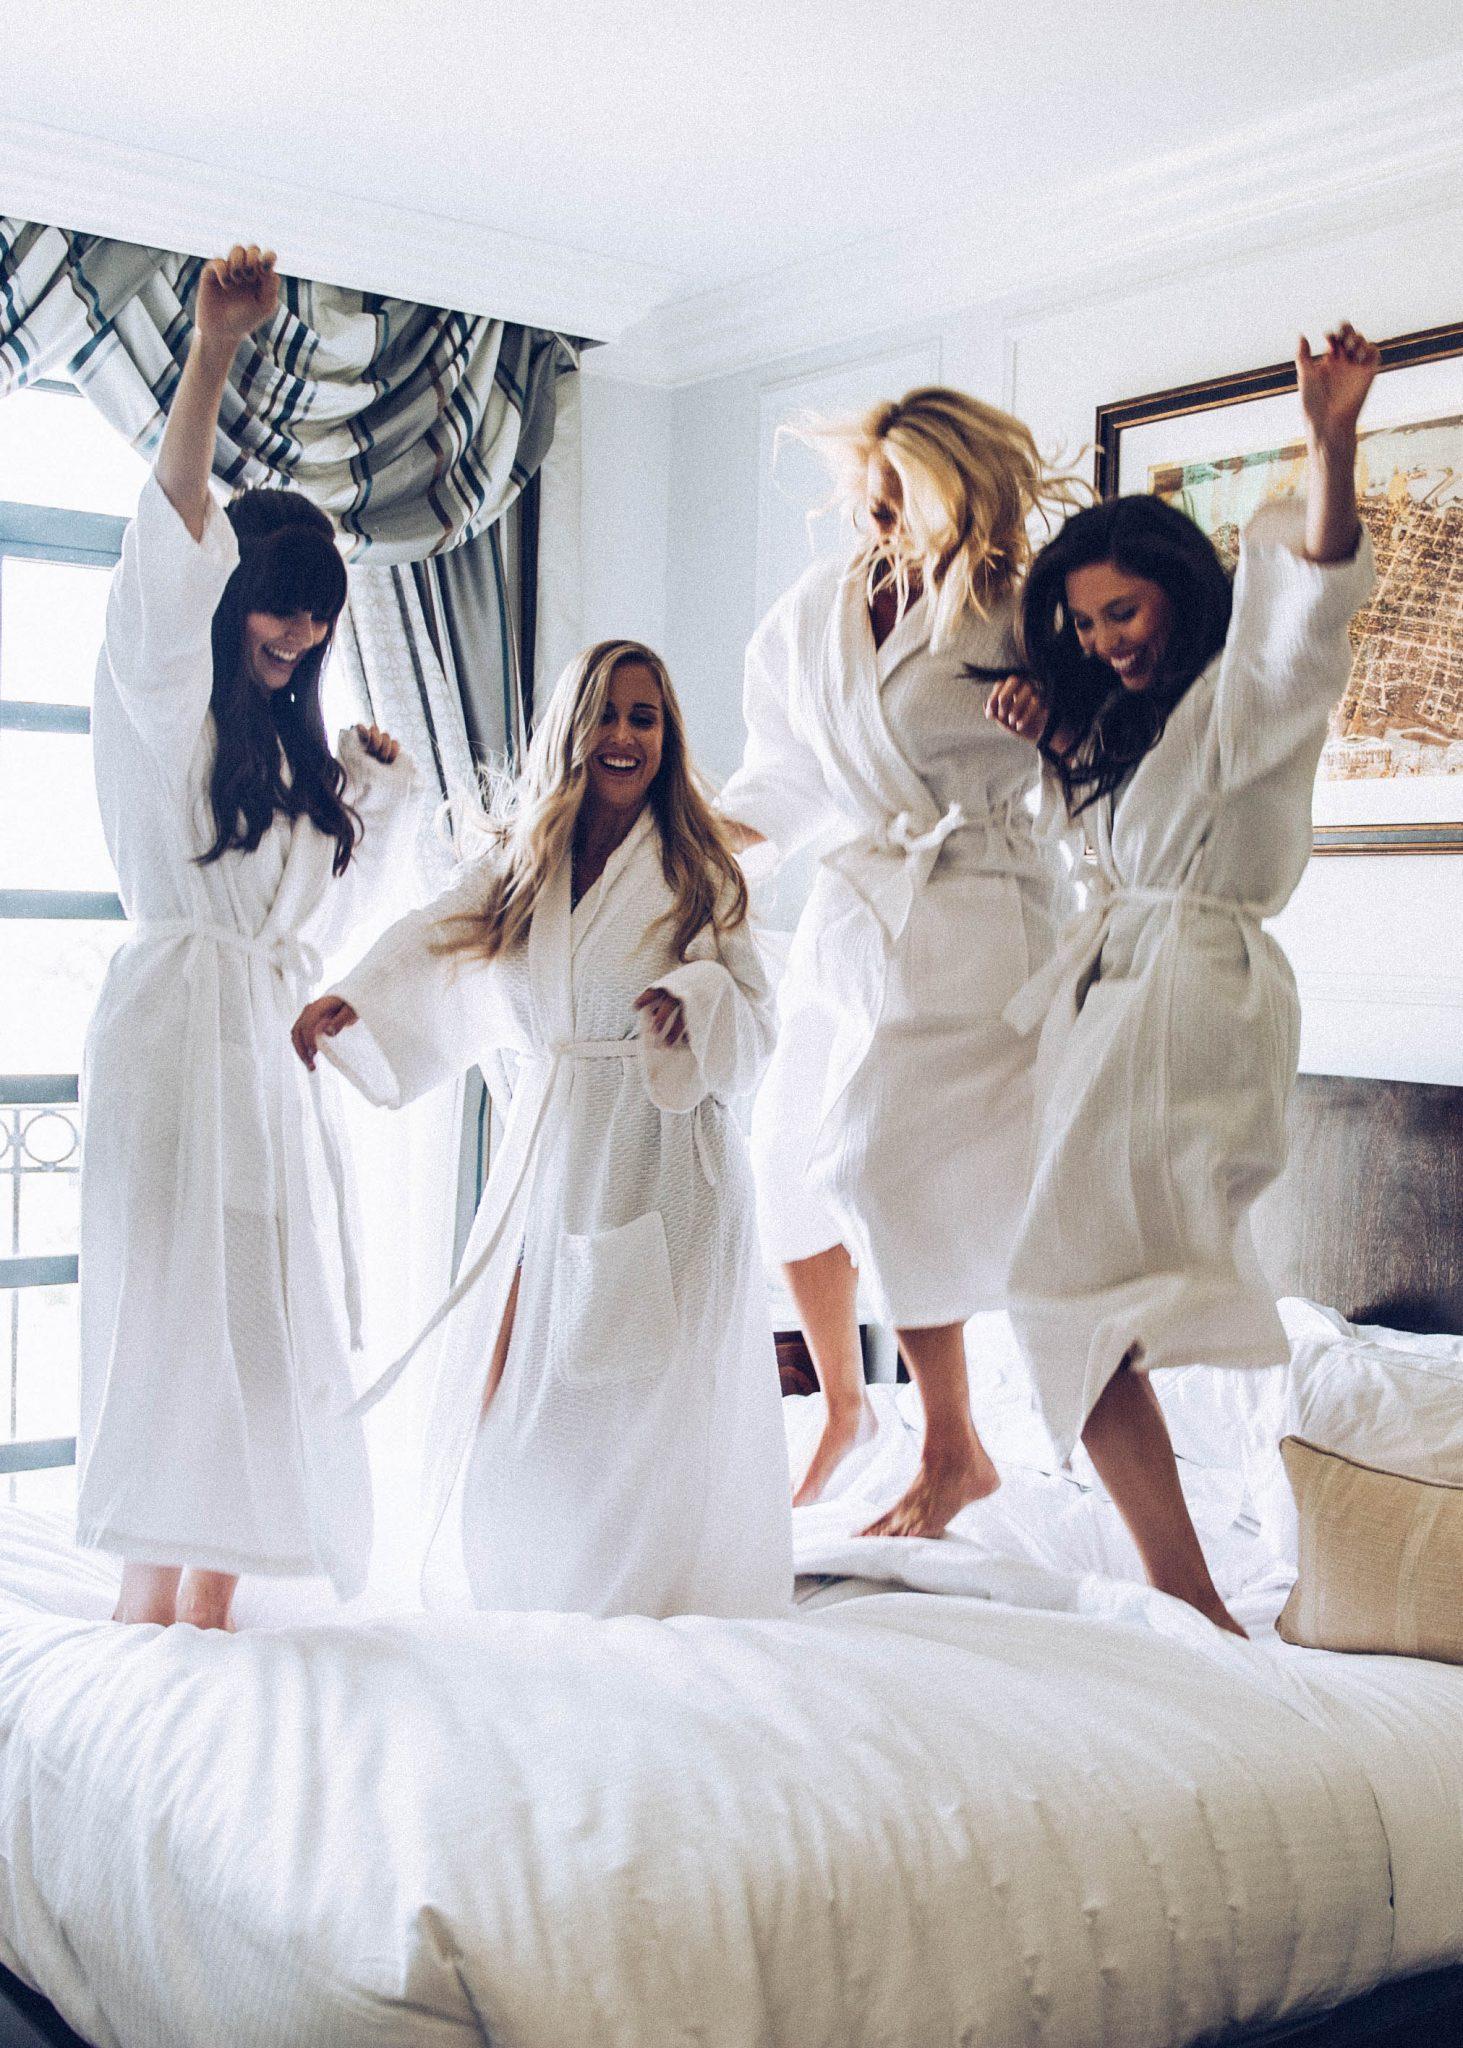 Ladies Night: רעיונות למסיבת רווקות ביתית מושלמת